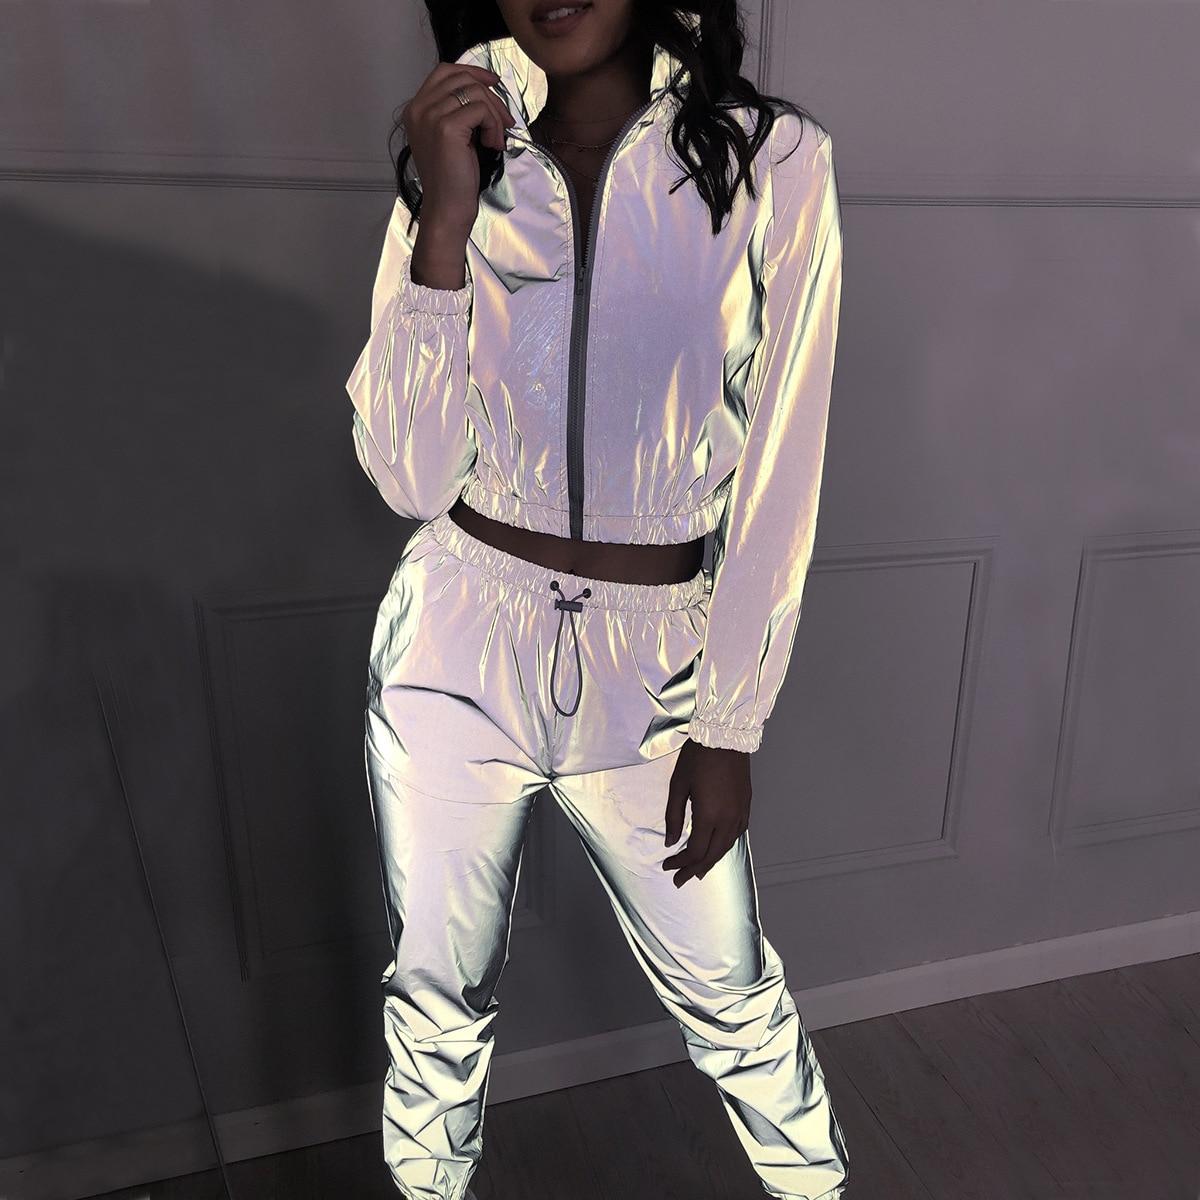 Fashion  2 Piece Women Tracksuits Set Reflective Jacket And Long Pants Ladies Loose Zipper Shine Sweatsuit Outfits Sets